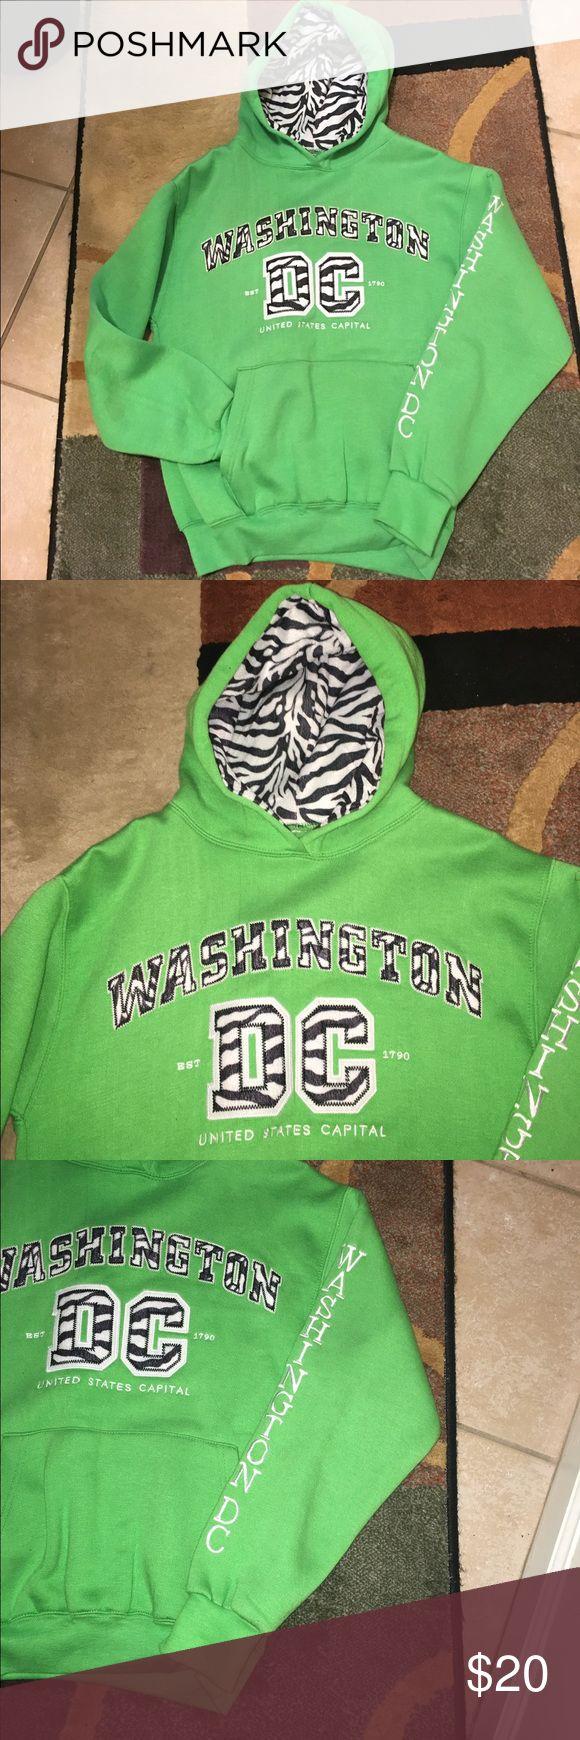 FREE DC CAP/WASHINGTON DC HOODIE WASHINGTON DC LIME GREEN HOODIE WITH KANGAROO POCKETS SIZE SMALL WORN ONE TIME Tops Sweatshirts & Hoodies